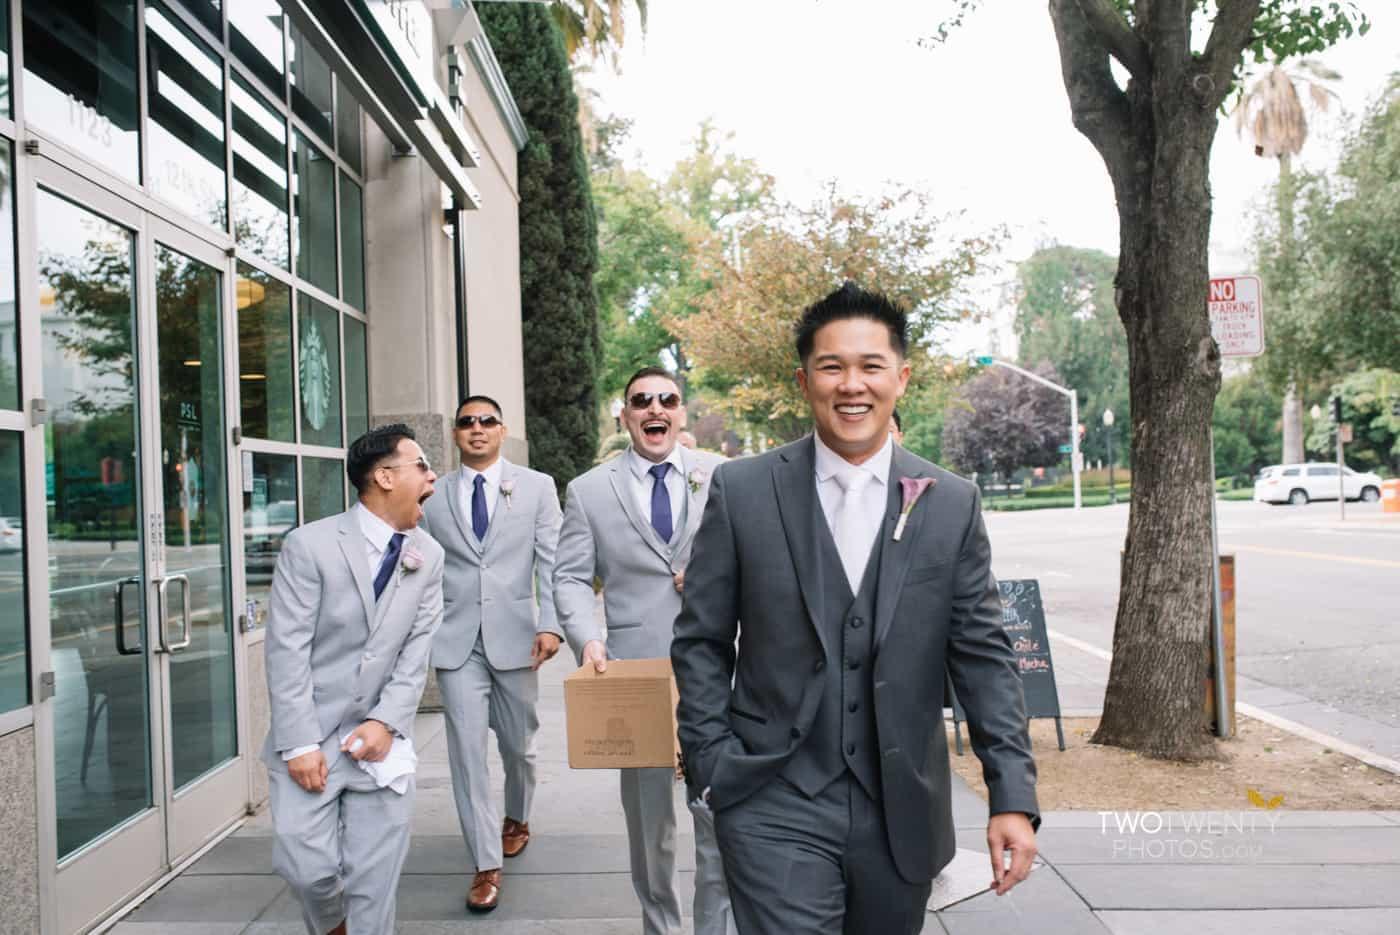 hyatt-regency-downtown-sacramento-wedding-photographer-25